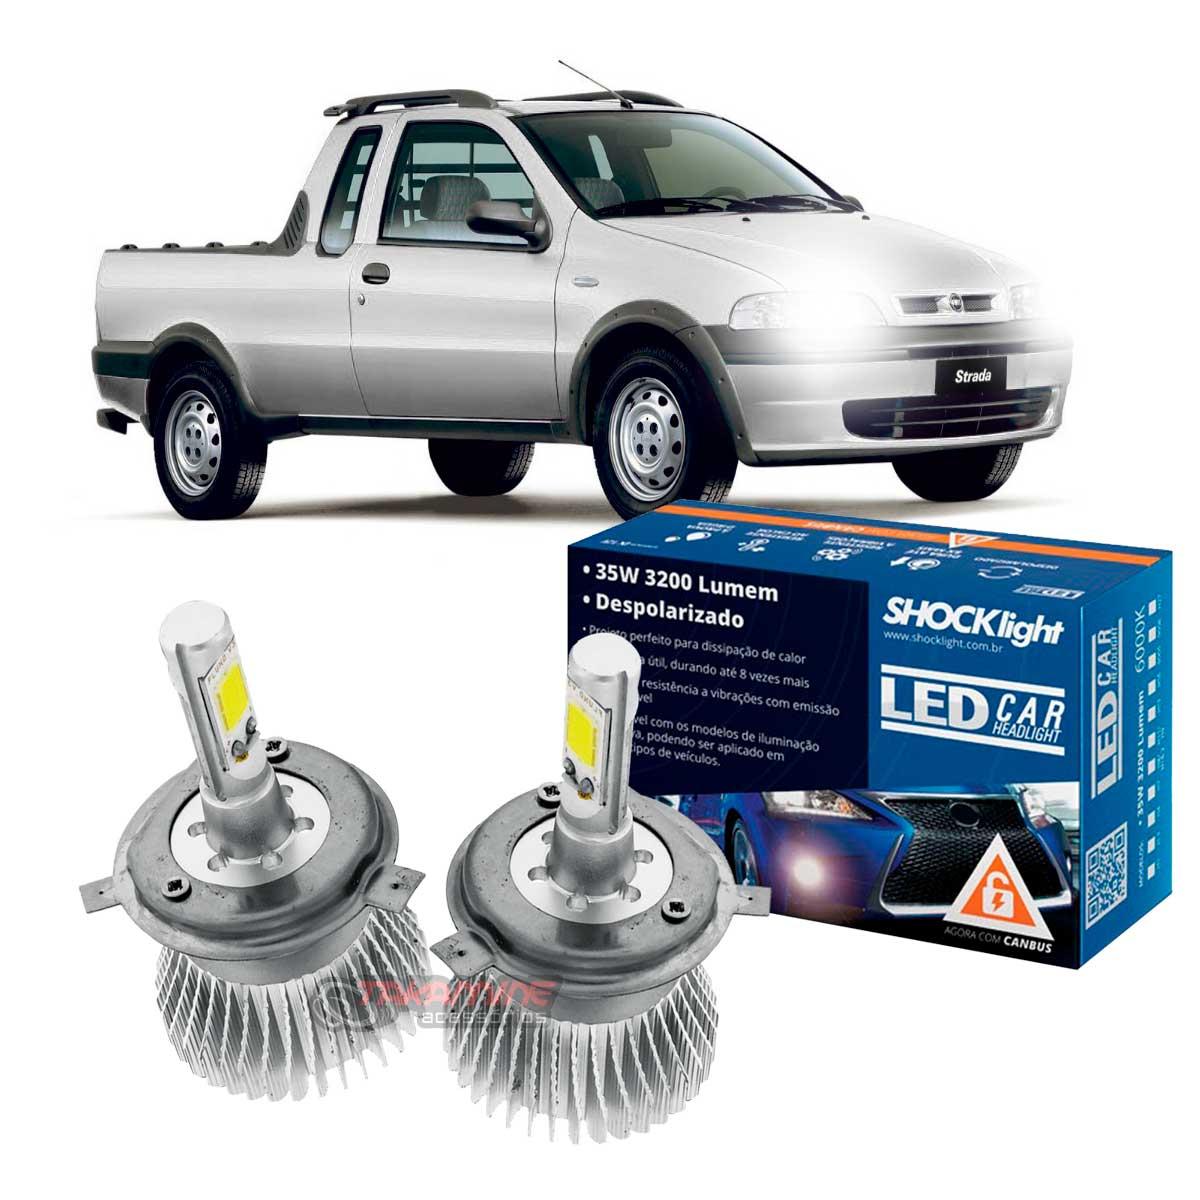 Kit LED Strada 1996 1997 1998 1999 2000 2001 tipo xenon farol alto e baixo H4 35W Headlight